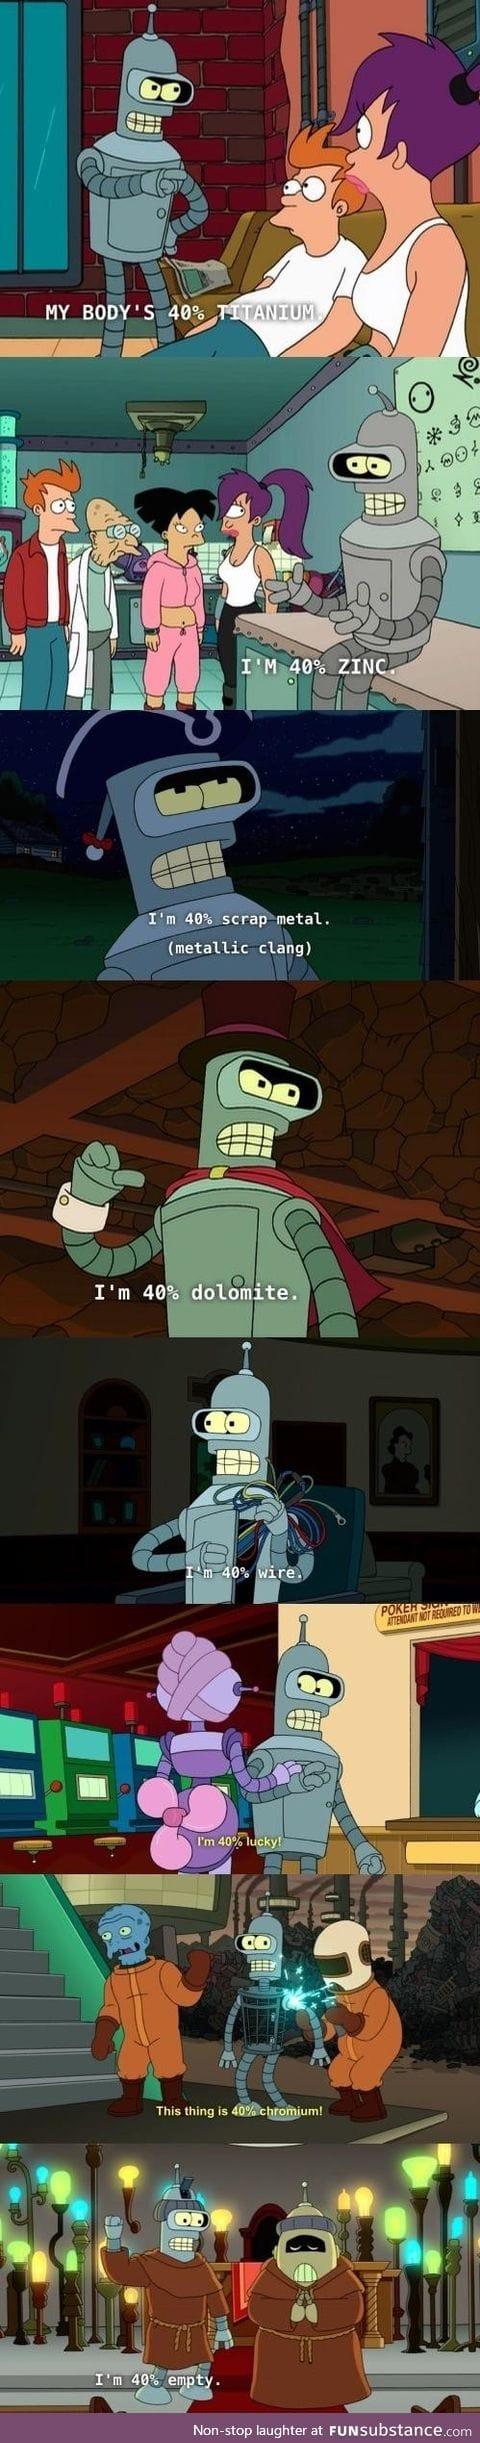 Bender's 320%